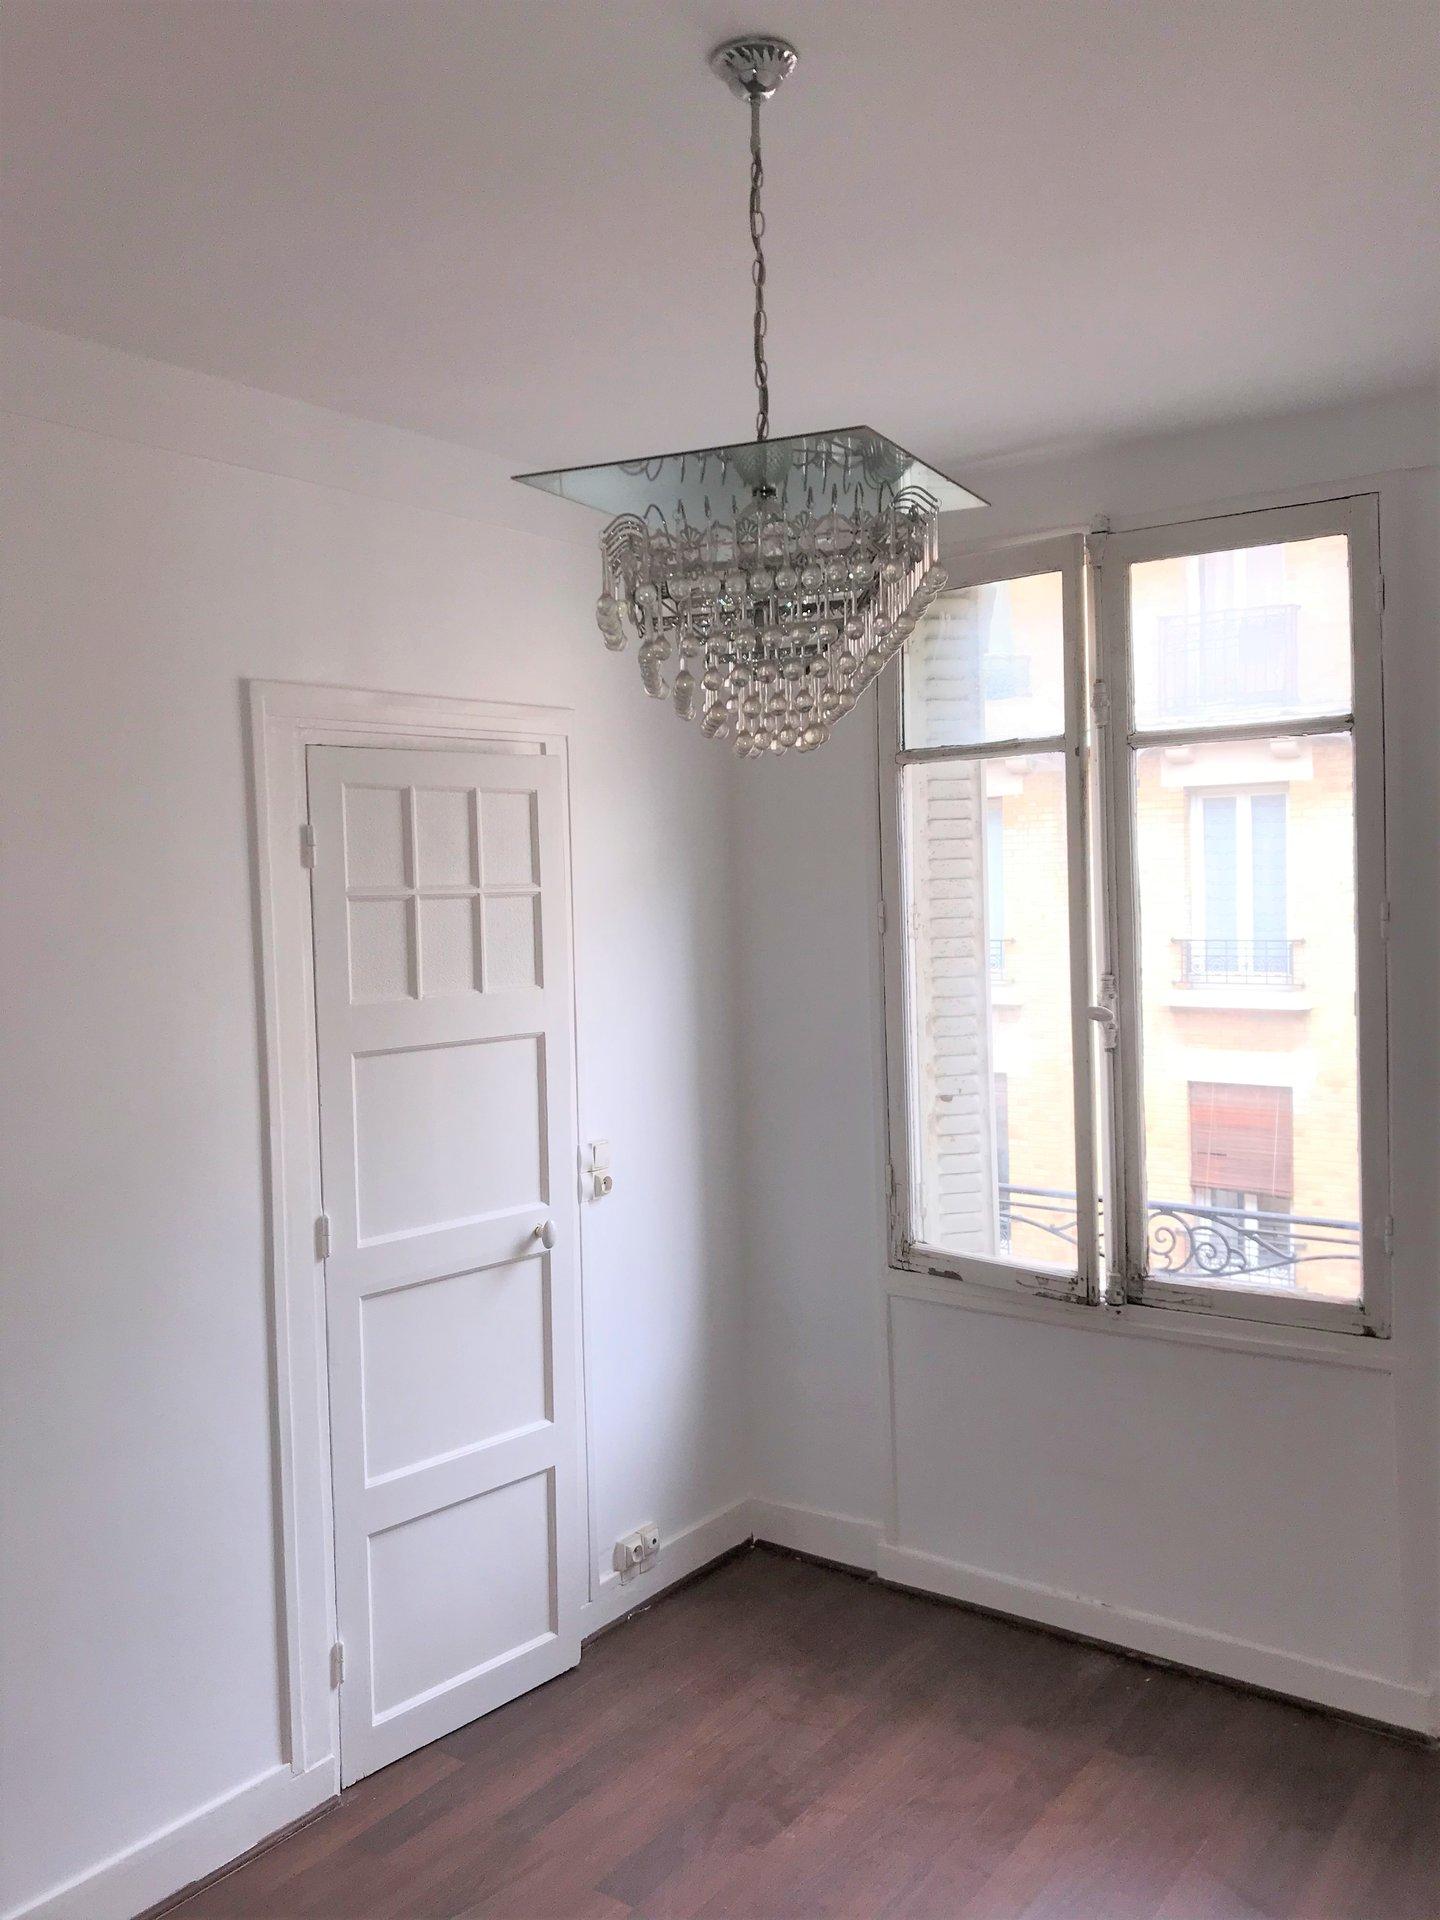 F2 de 23.10 m² / Rue Henri Poincaré à Clichy